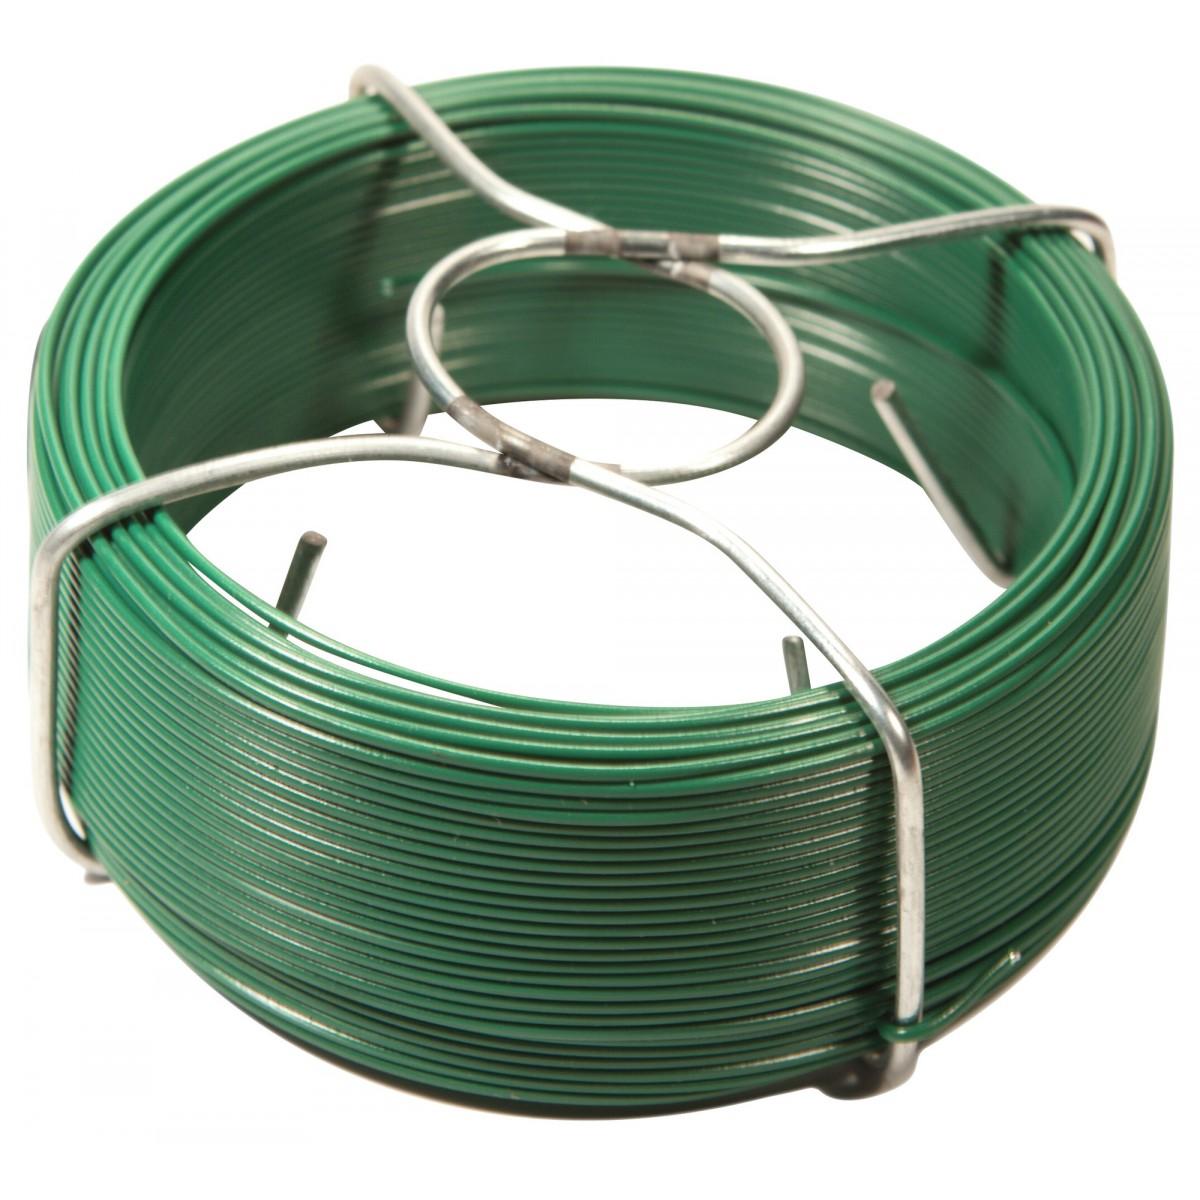 Bobinot plastifié Filiac - Vert - Longueur 100 m